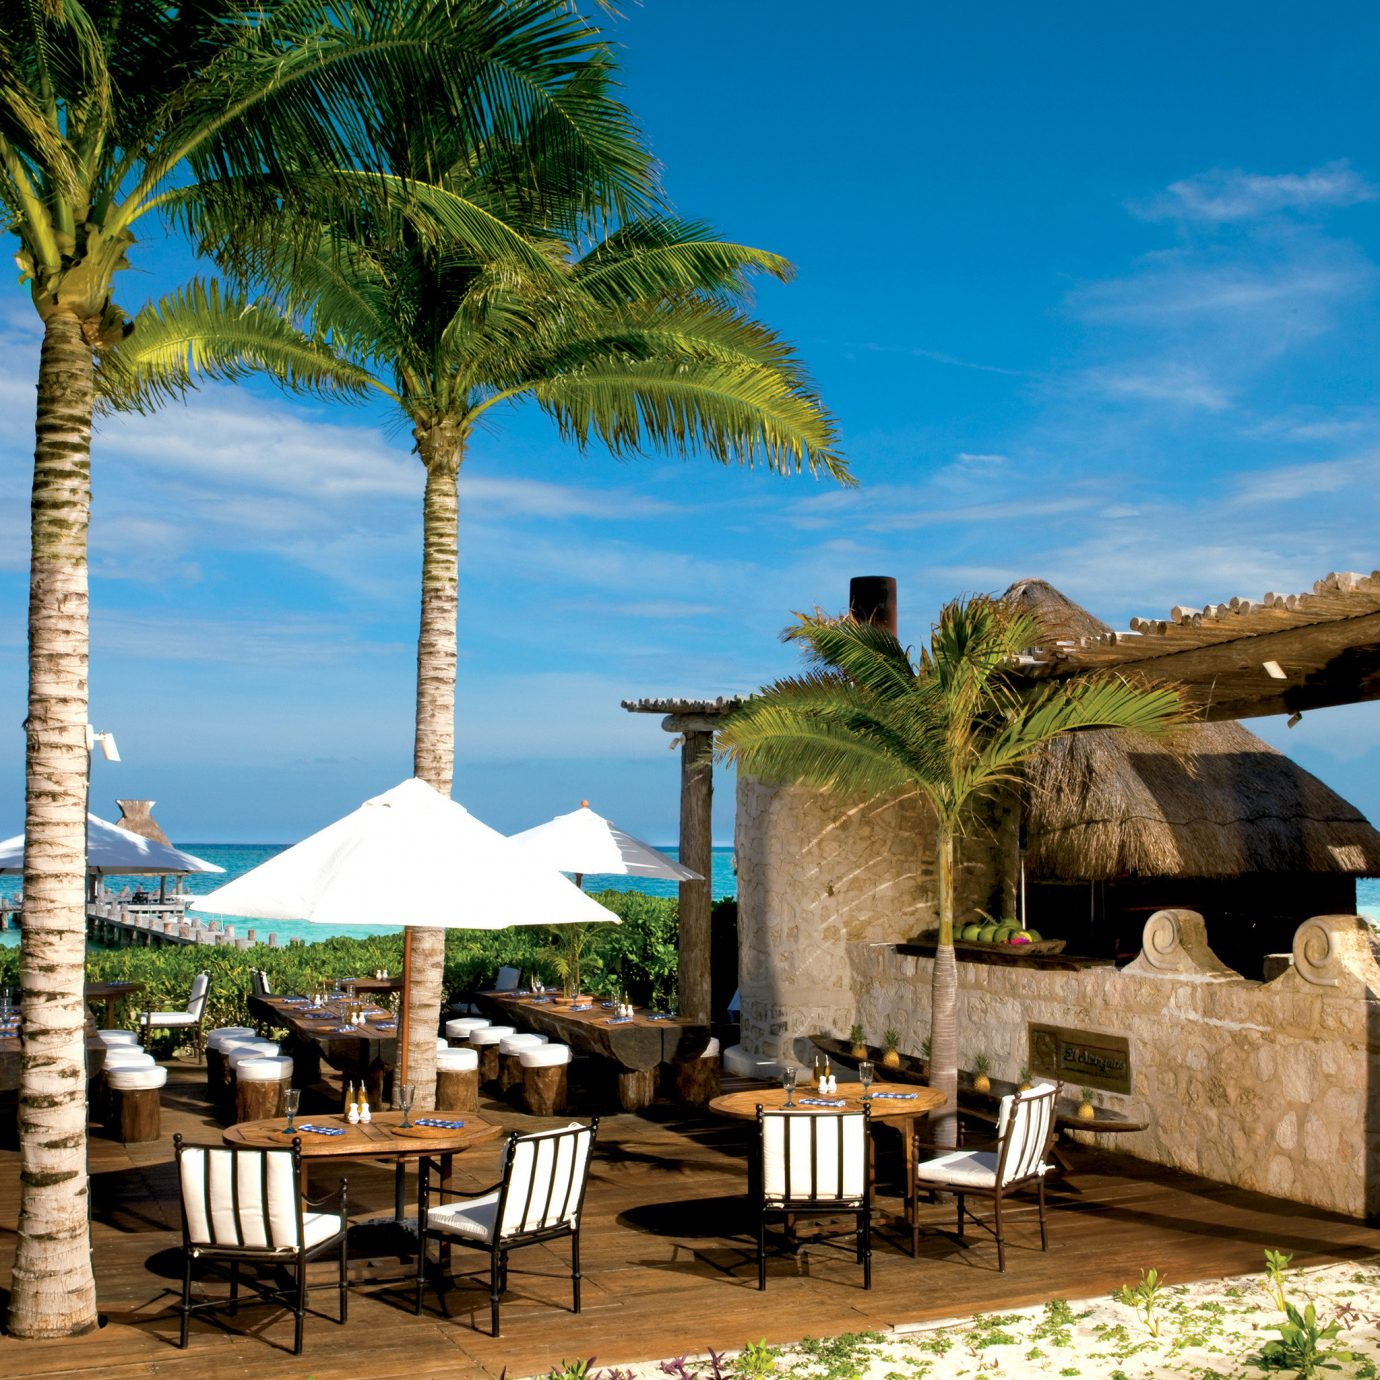 Beach Beachfront Deck Dining Hotels Lounge tree chair property Resort hacienda arecales wooden Villa caribbean plant